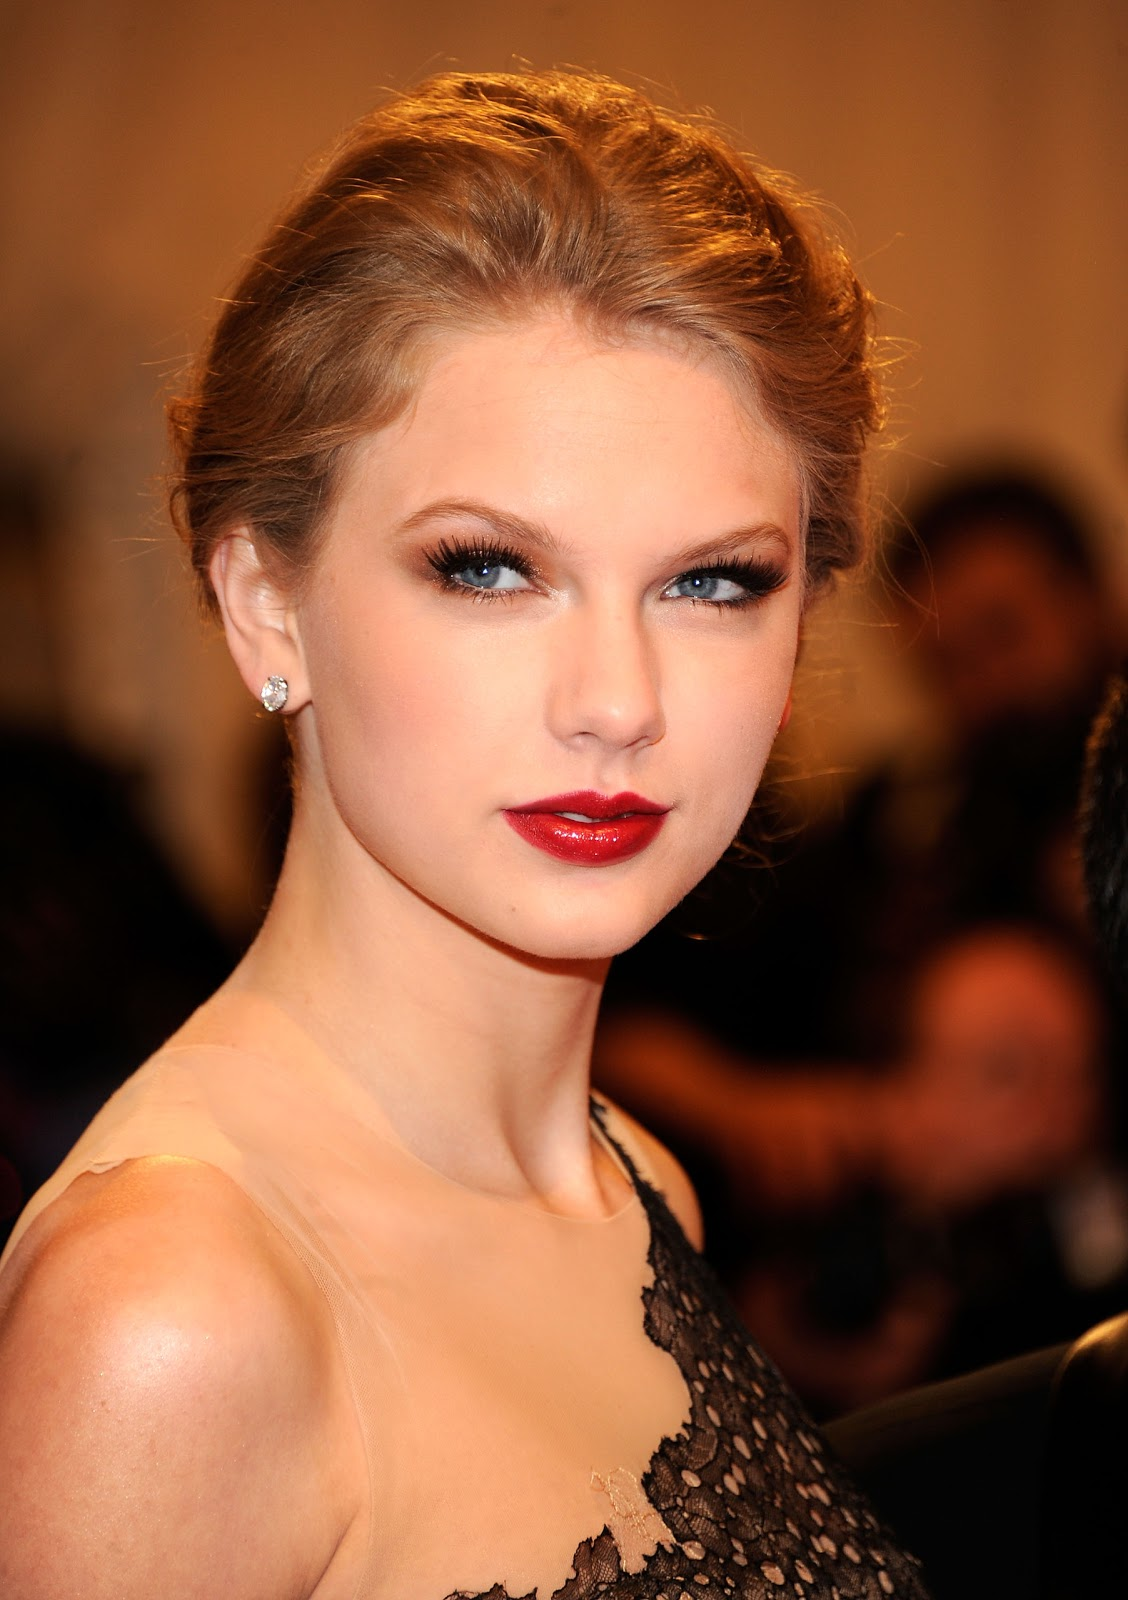 http://3.bp.blogspot.com/-pI-ZhhNFgcM/TdKJSp9eCRI/AAAAAAAAJpM/M07DYb7FK2k/s1600/Taylor+Swift+-+Alexander+McQueen+Savage+Beauty+Costume+Institute+Gala+%25281%2529.jpg